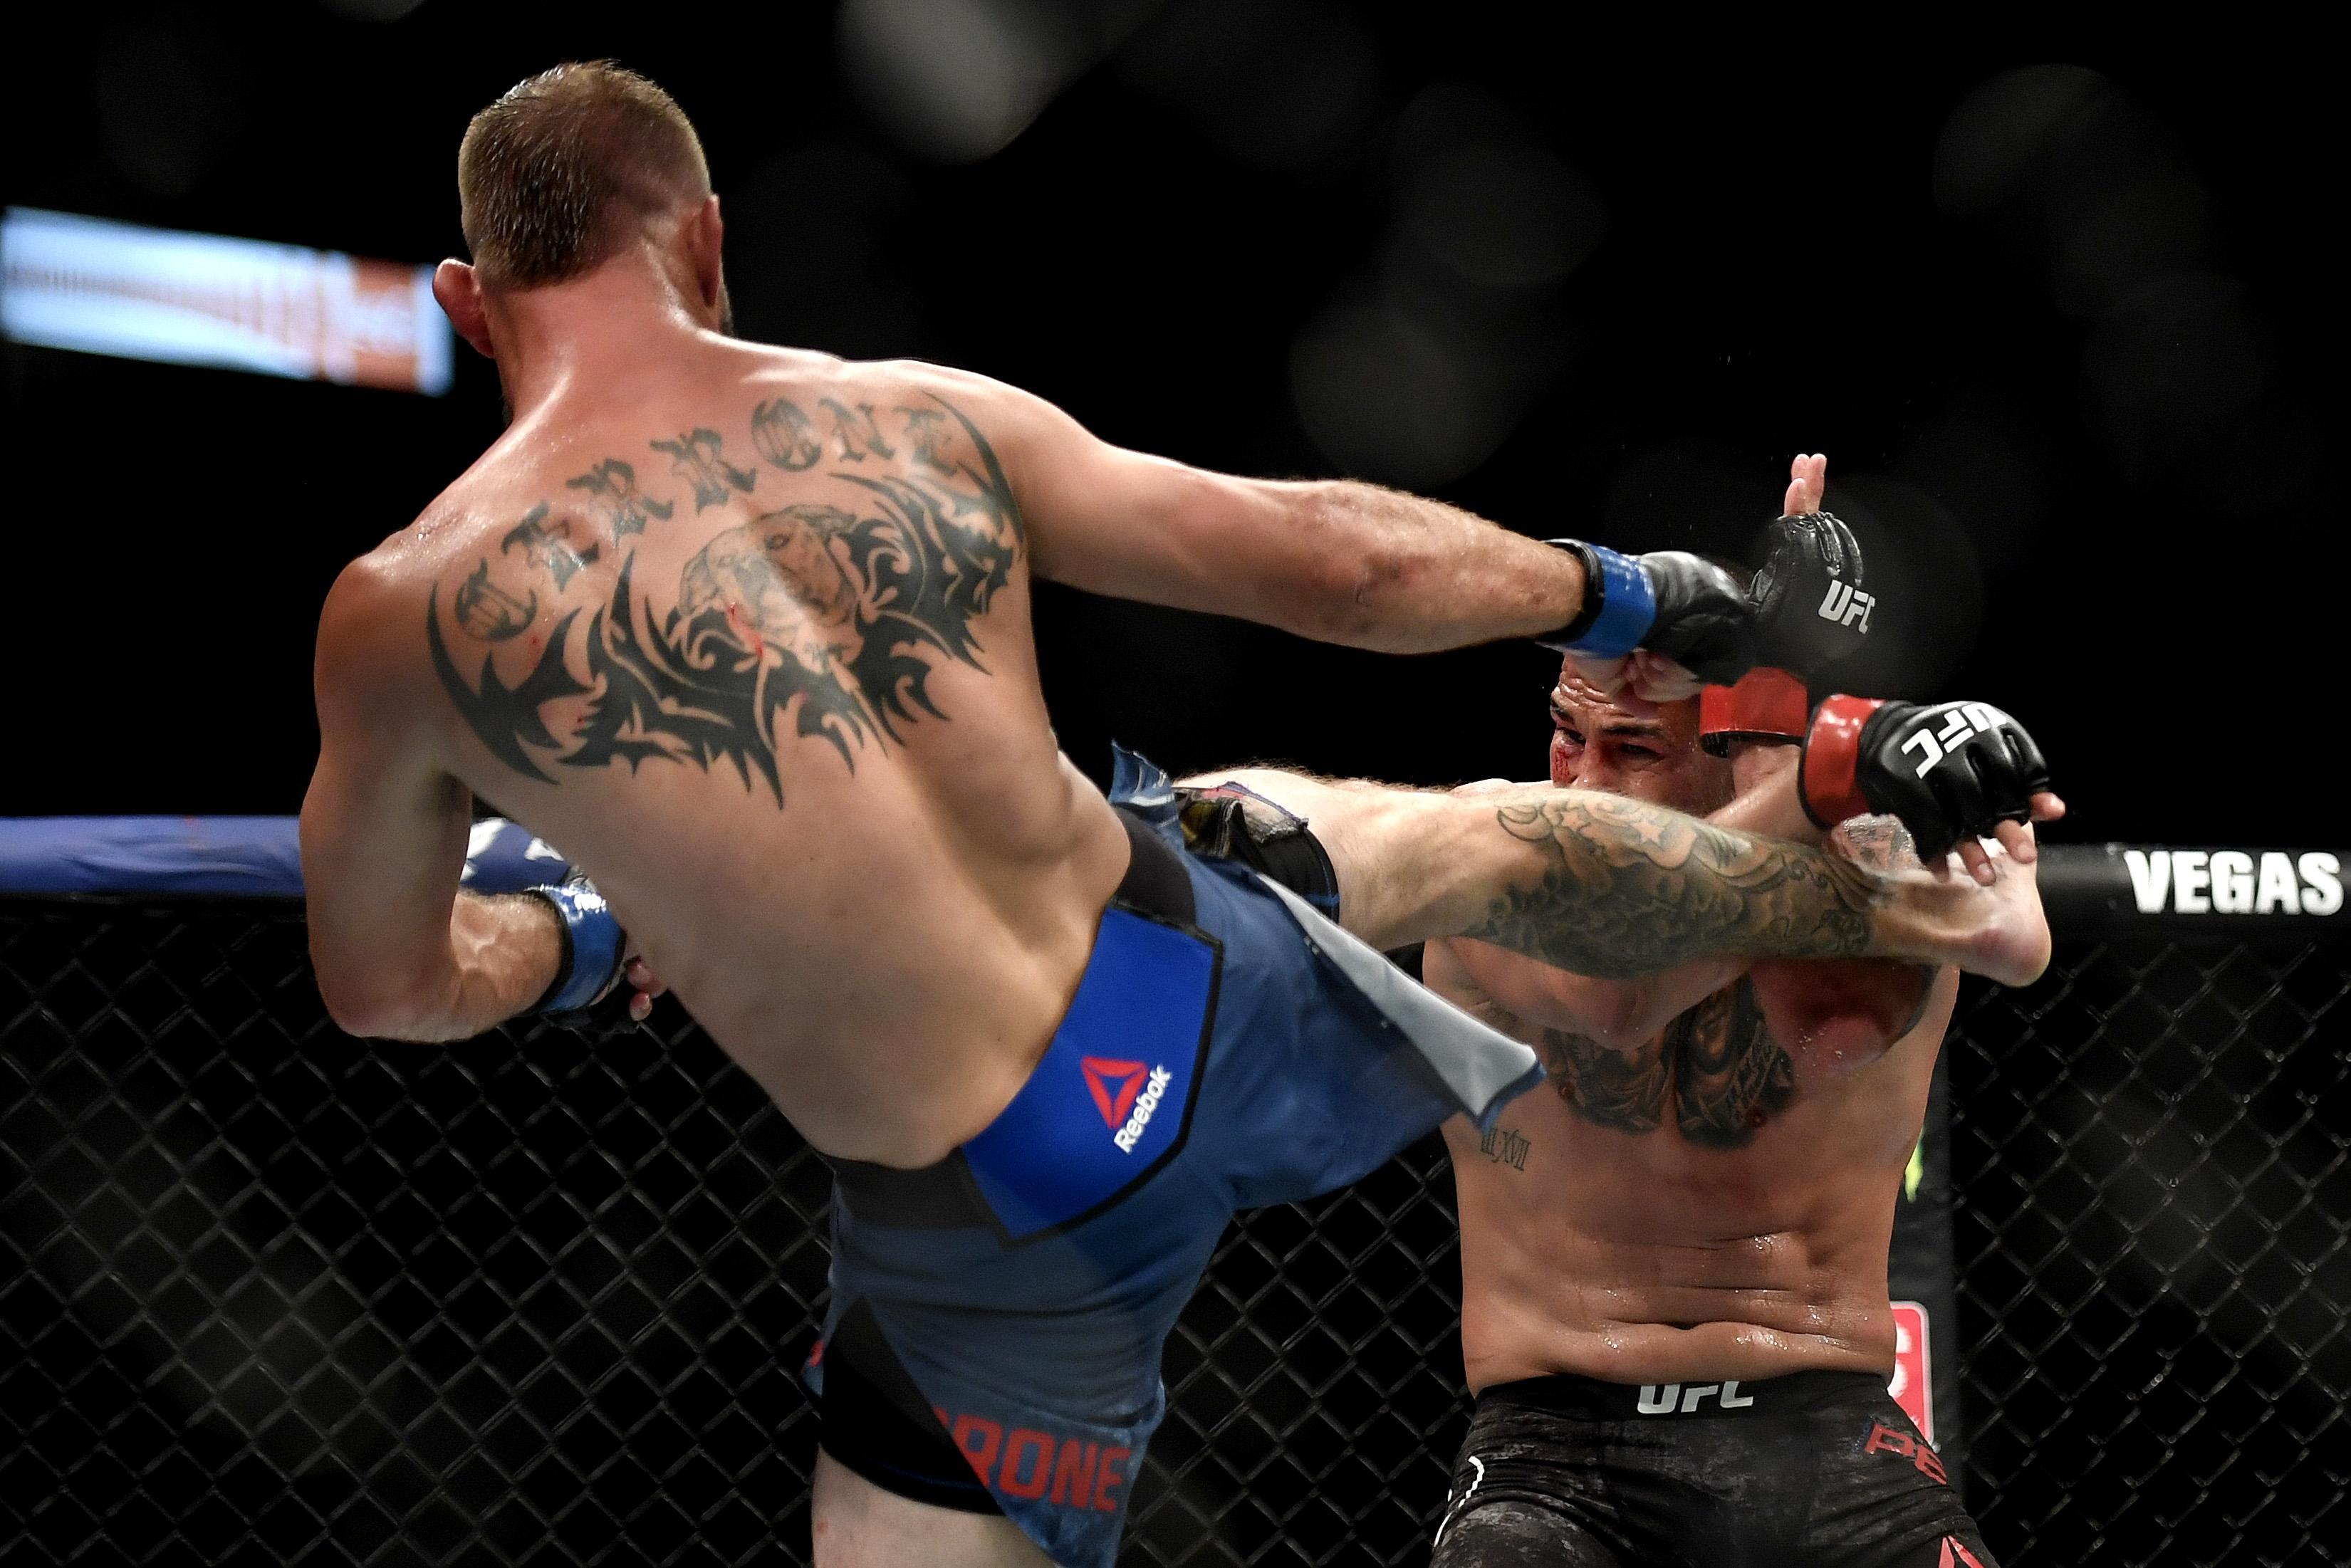 UFC 249佩蒂斯对塞罗尼